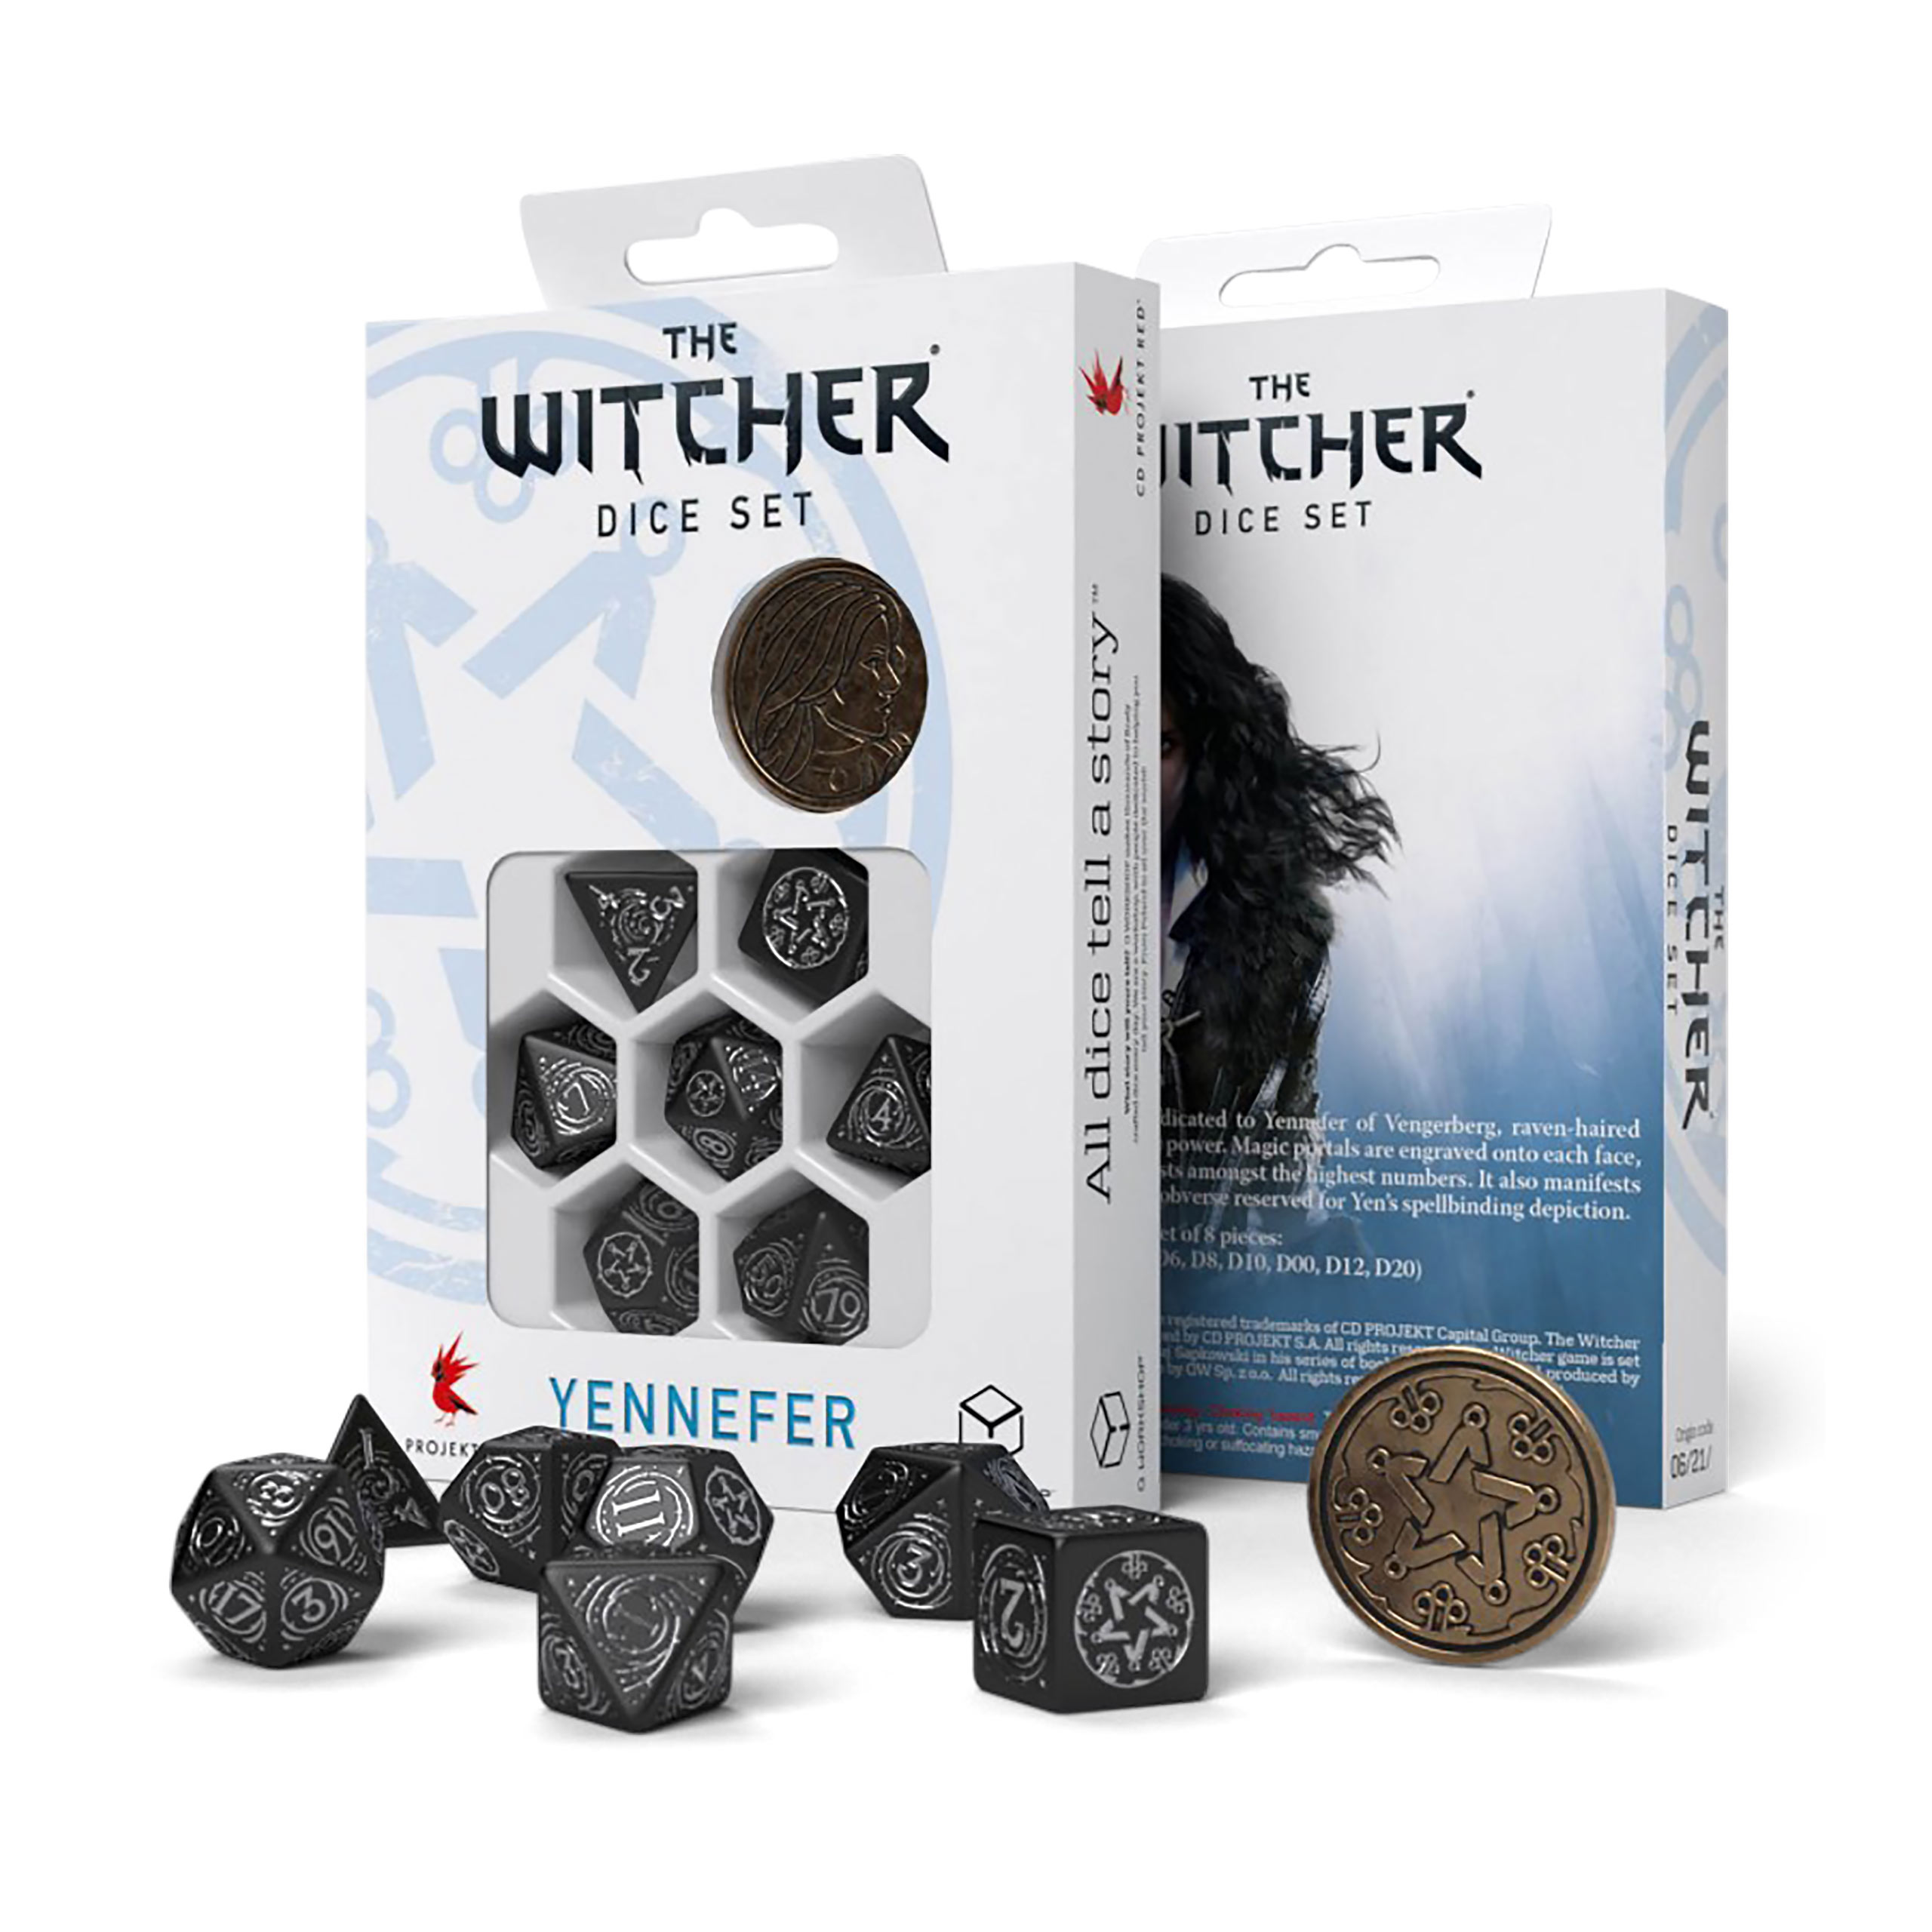 Witcher - Yennefer Obsidian Star RPG Würfel Set 7tlg mit Sammlermünze